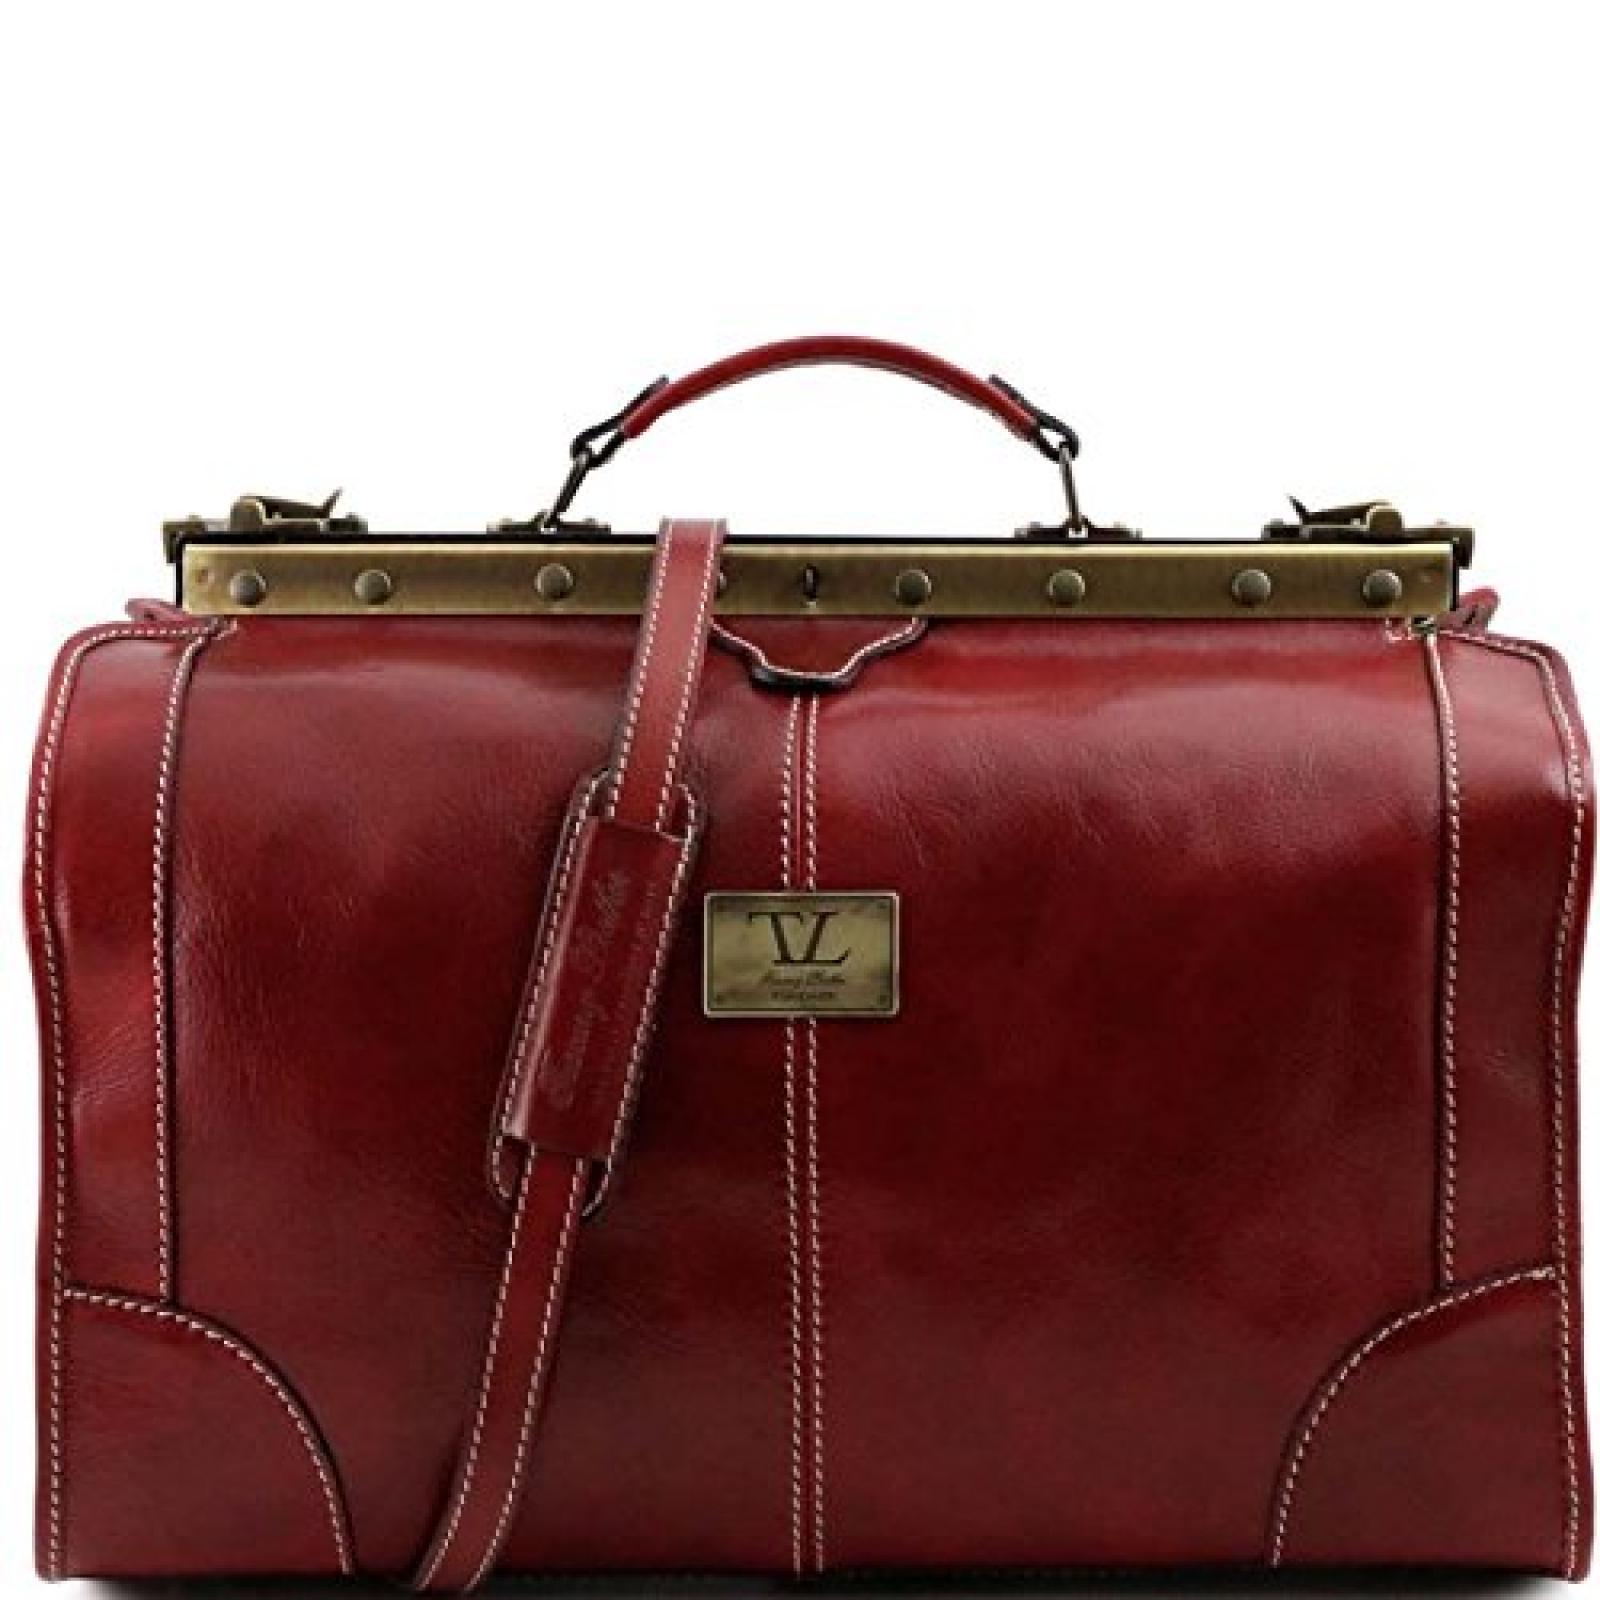 Tuscany Leather - Madrid - Maulbügelreisetasche aus Leder - Klein Rot - TL1023/4